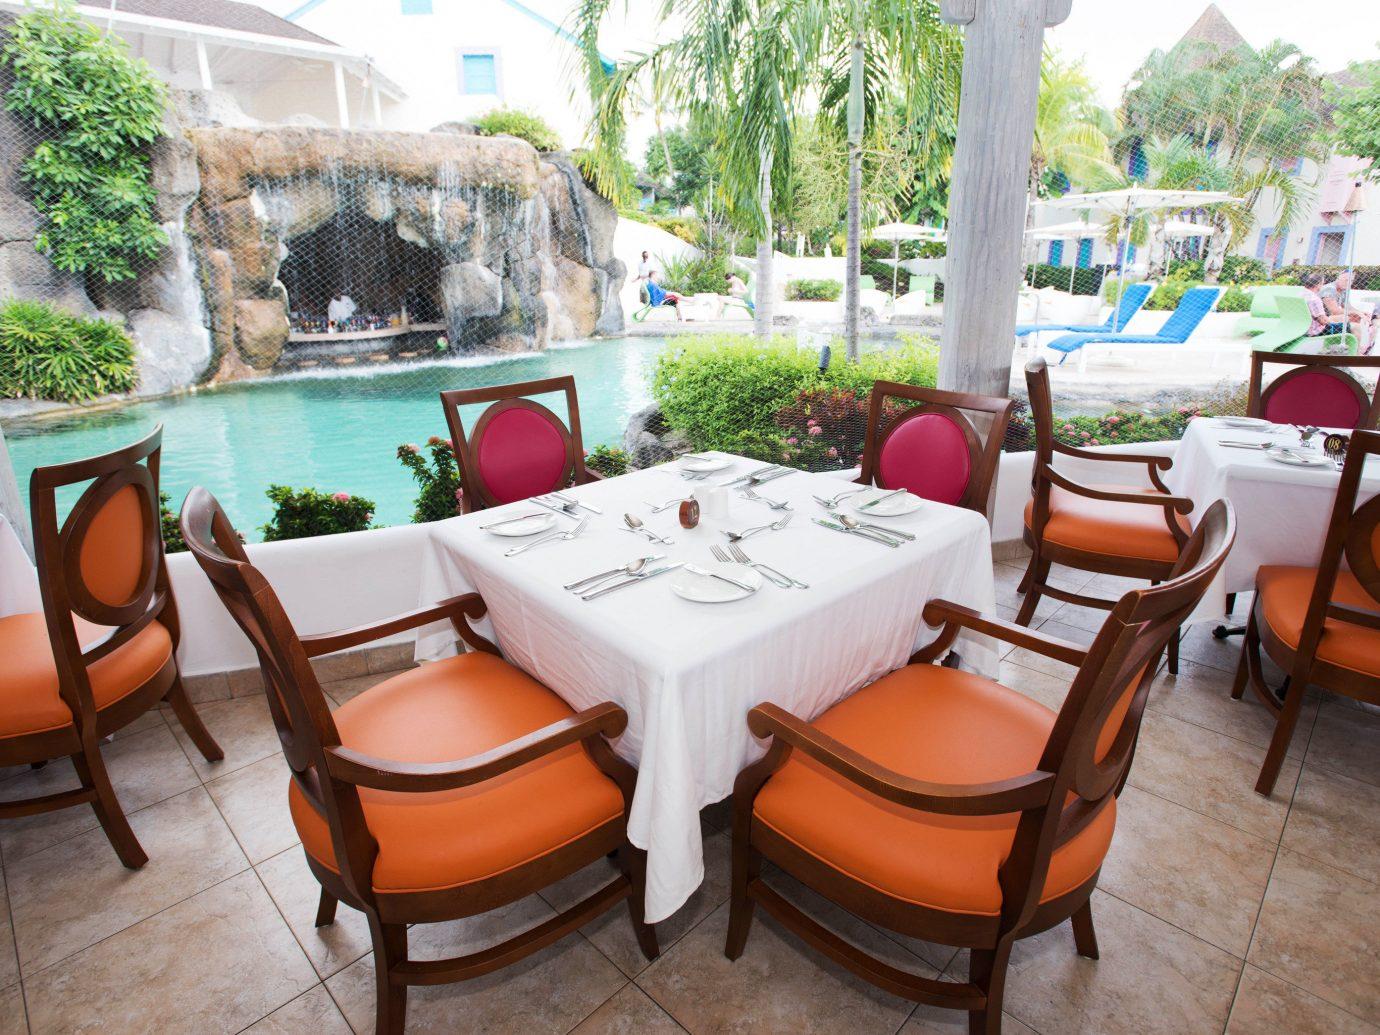 All-Inclusive Resorts Hotels floor chair table indoor property room estate restaurant real estate Villa Resort home interior design Dining furniture hacienda backyard area set dining table